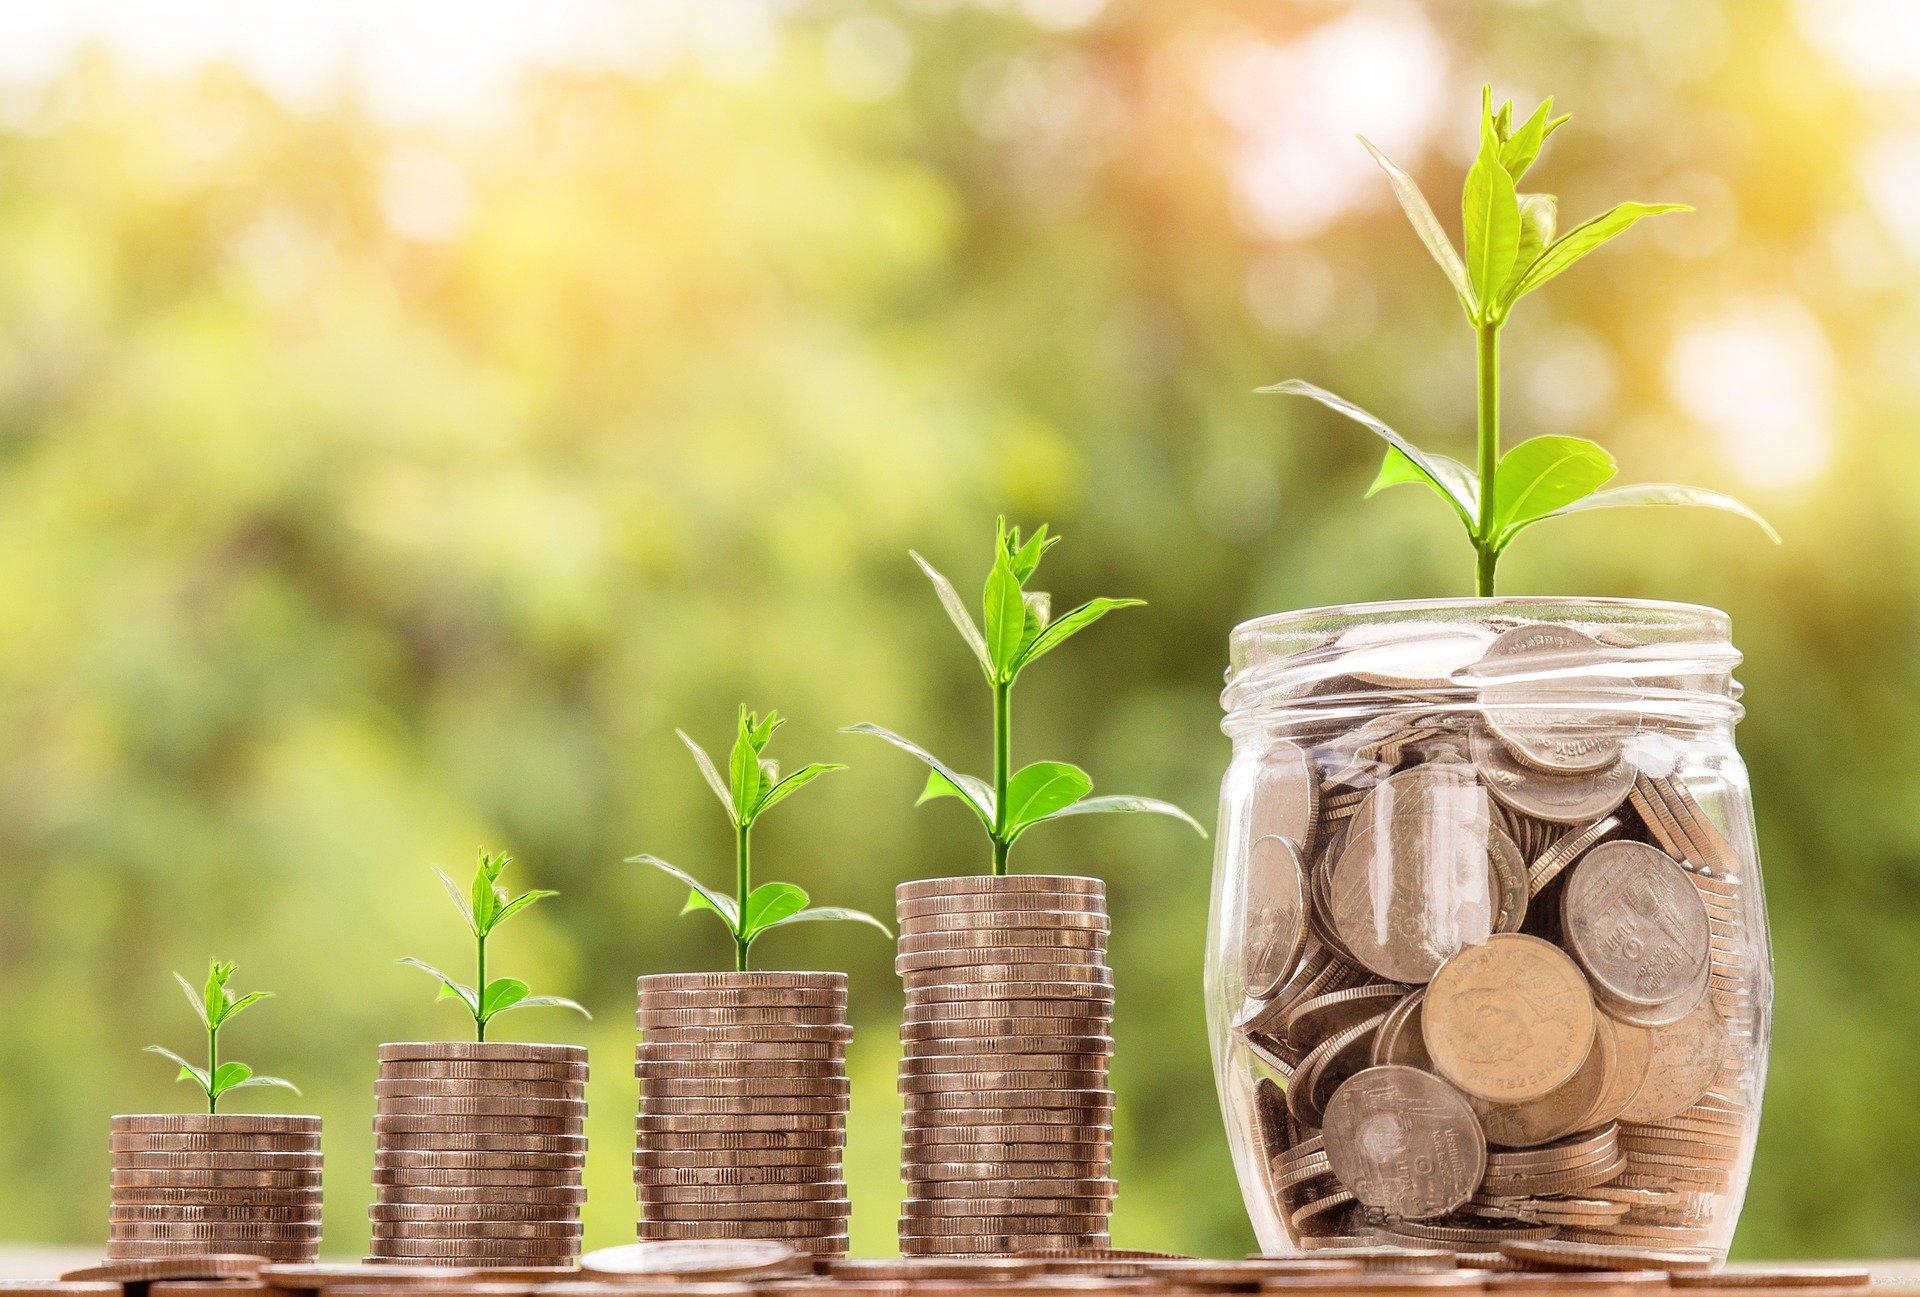 Money-growth